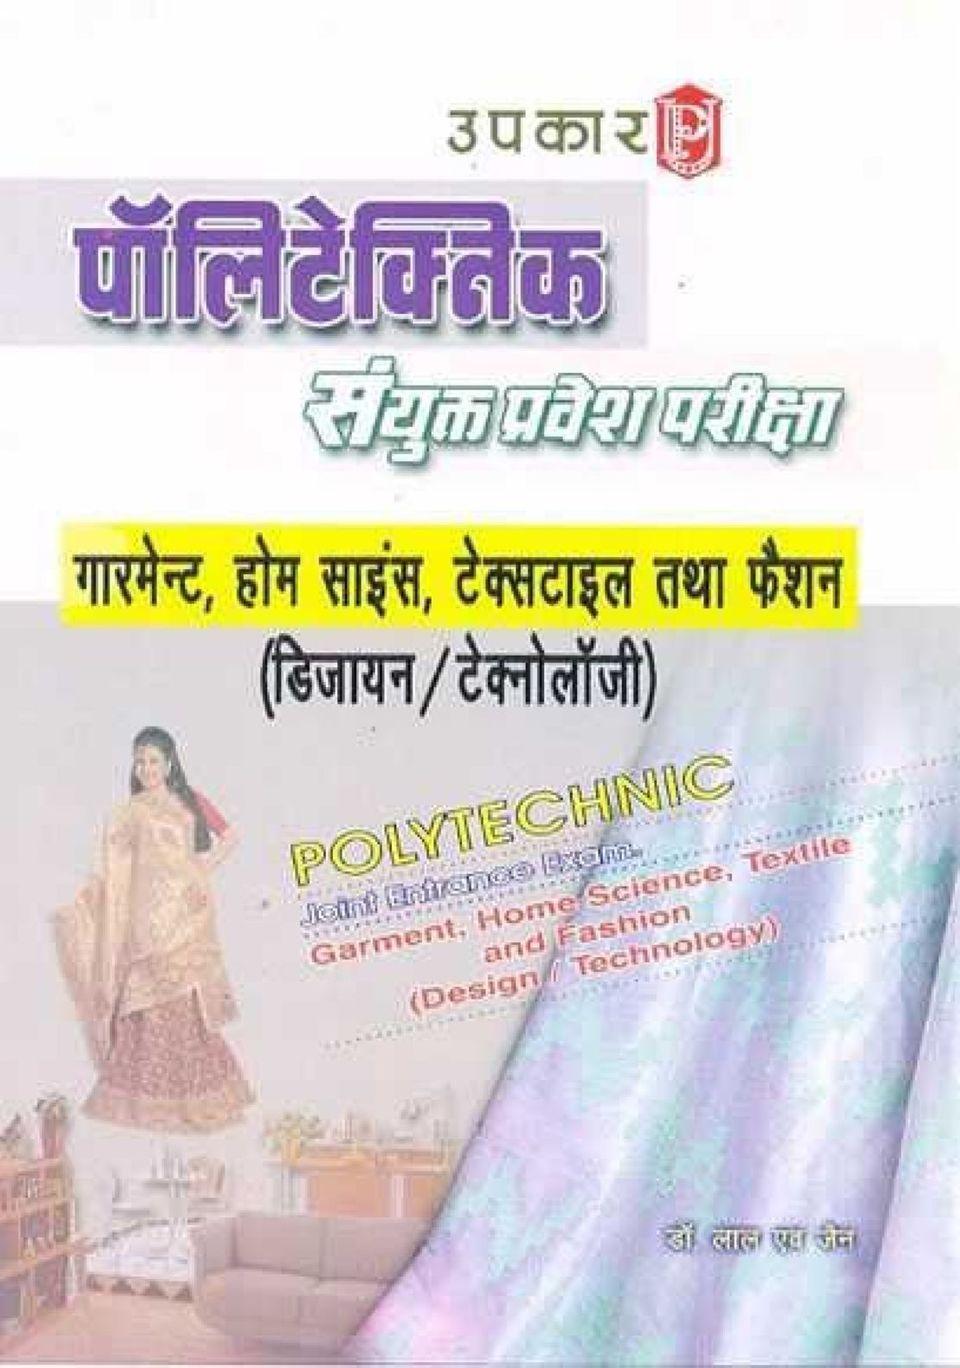 Polytechnic Sanyukt Pravesh Pariksha Garment Home Science Textiles And Fashion Design Technology Magazine